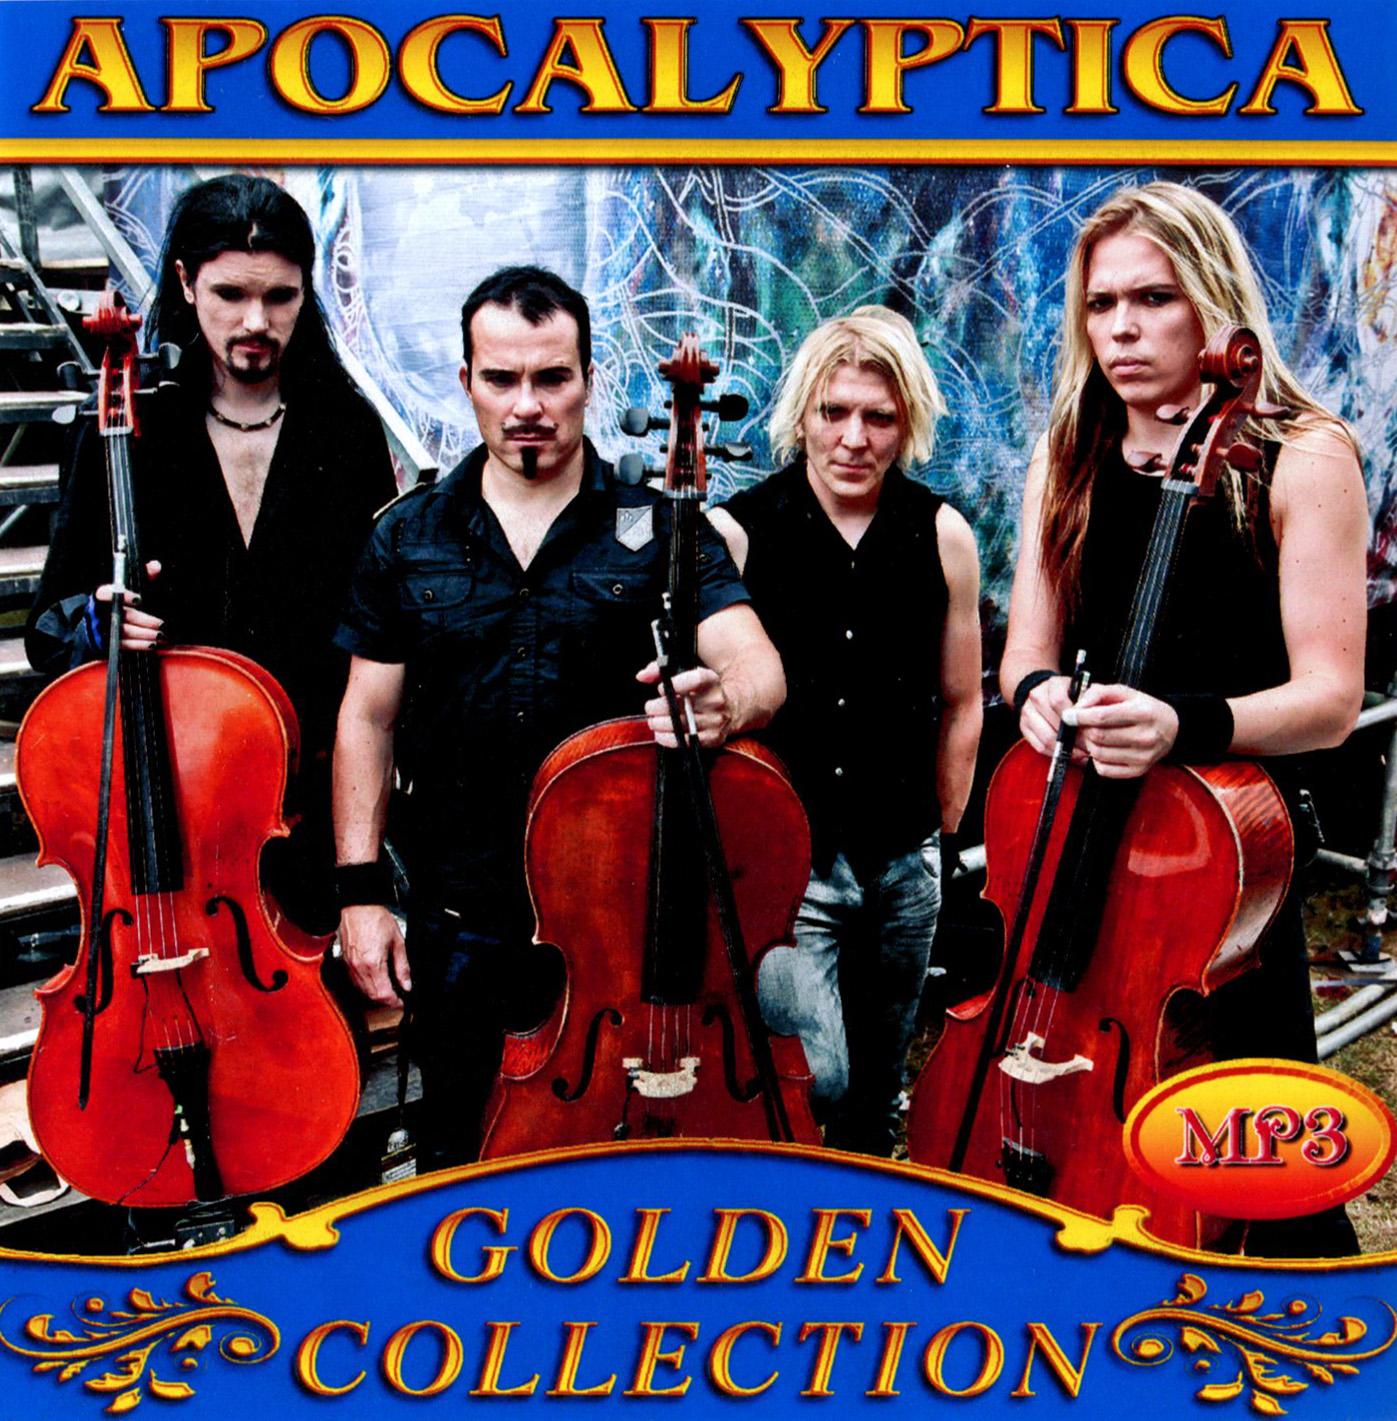 Apocalyptica [mp3]